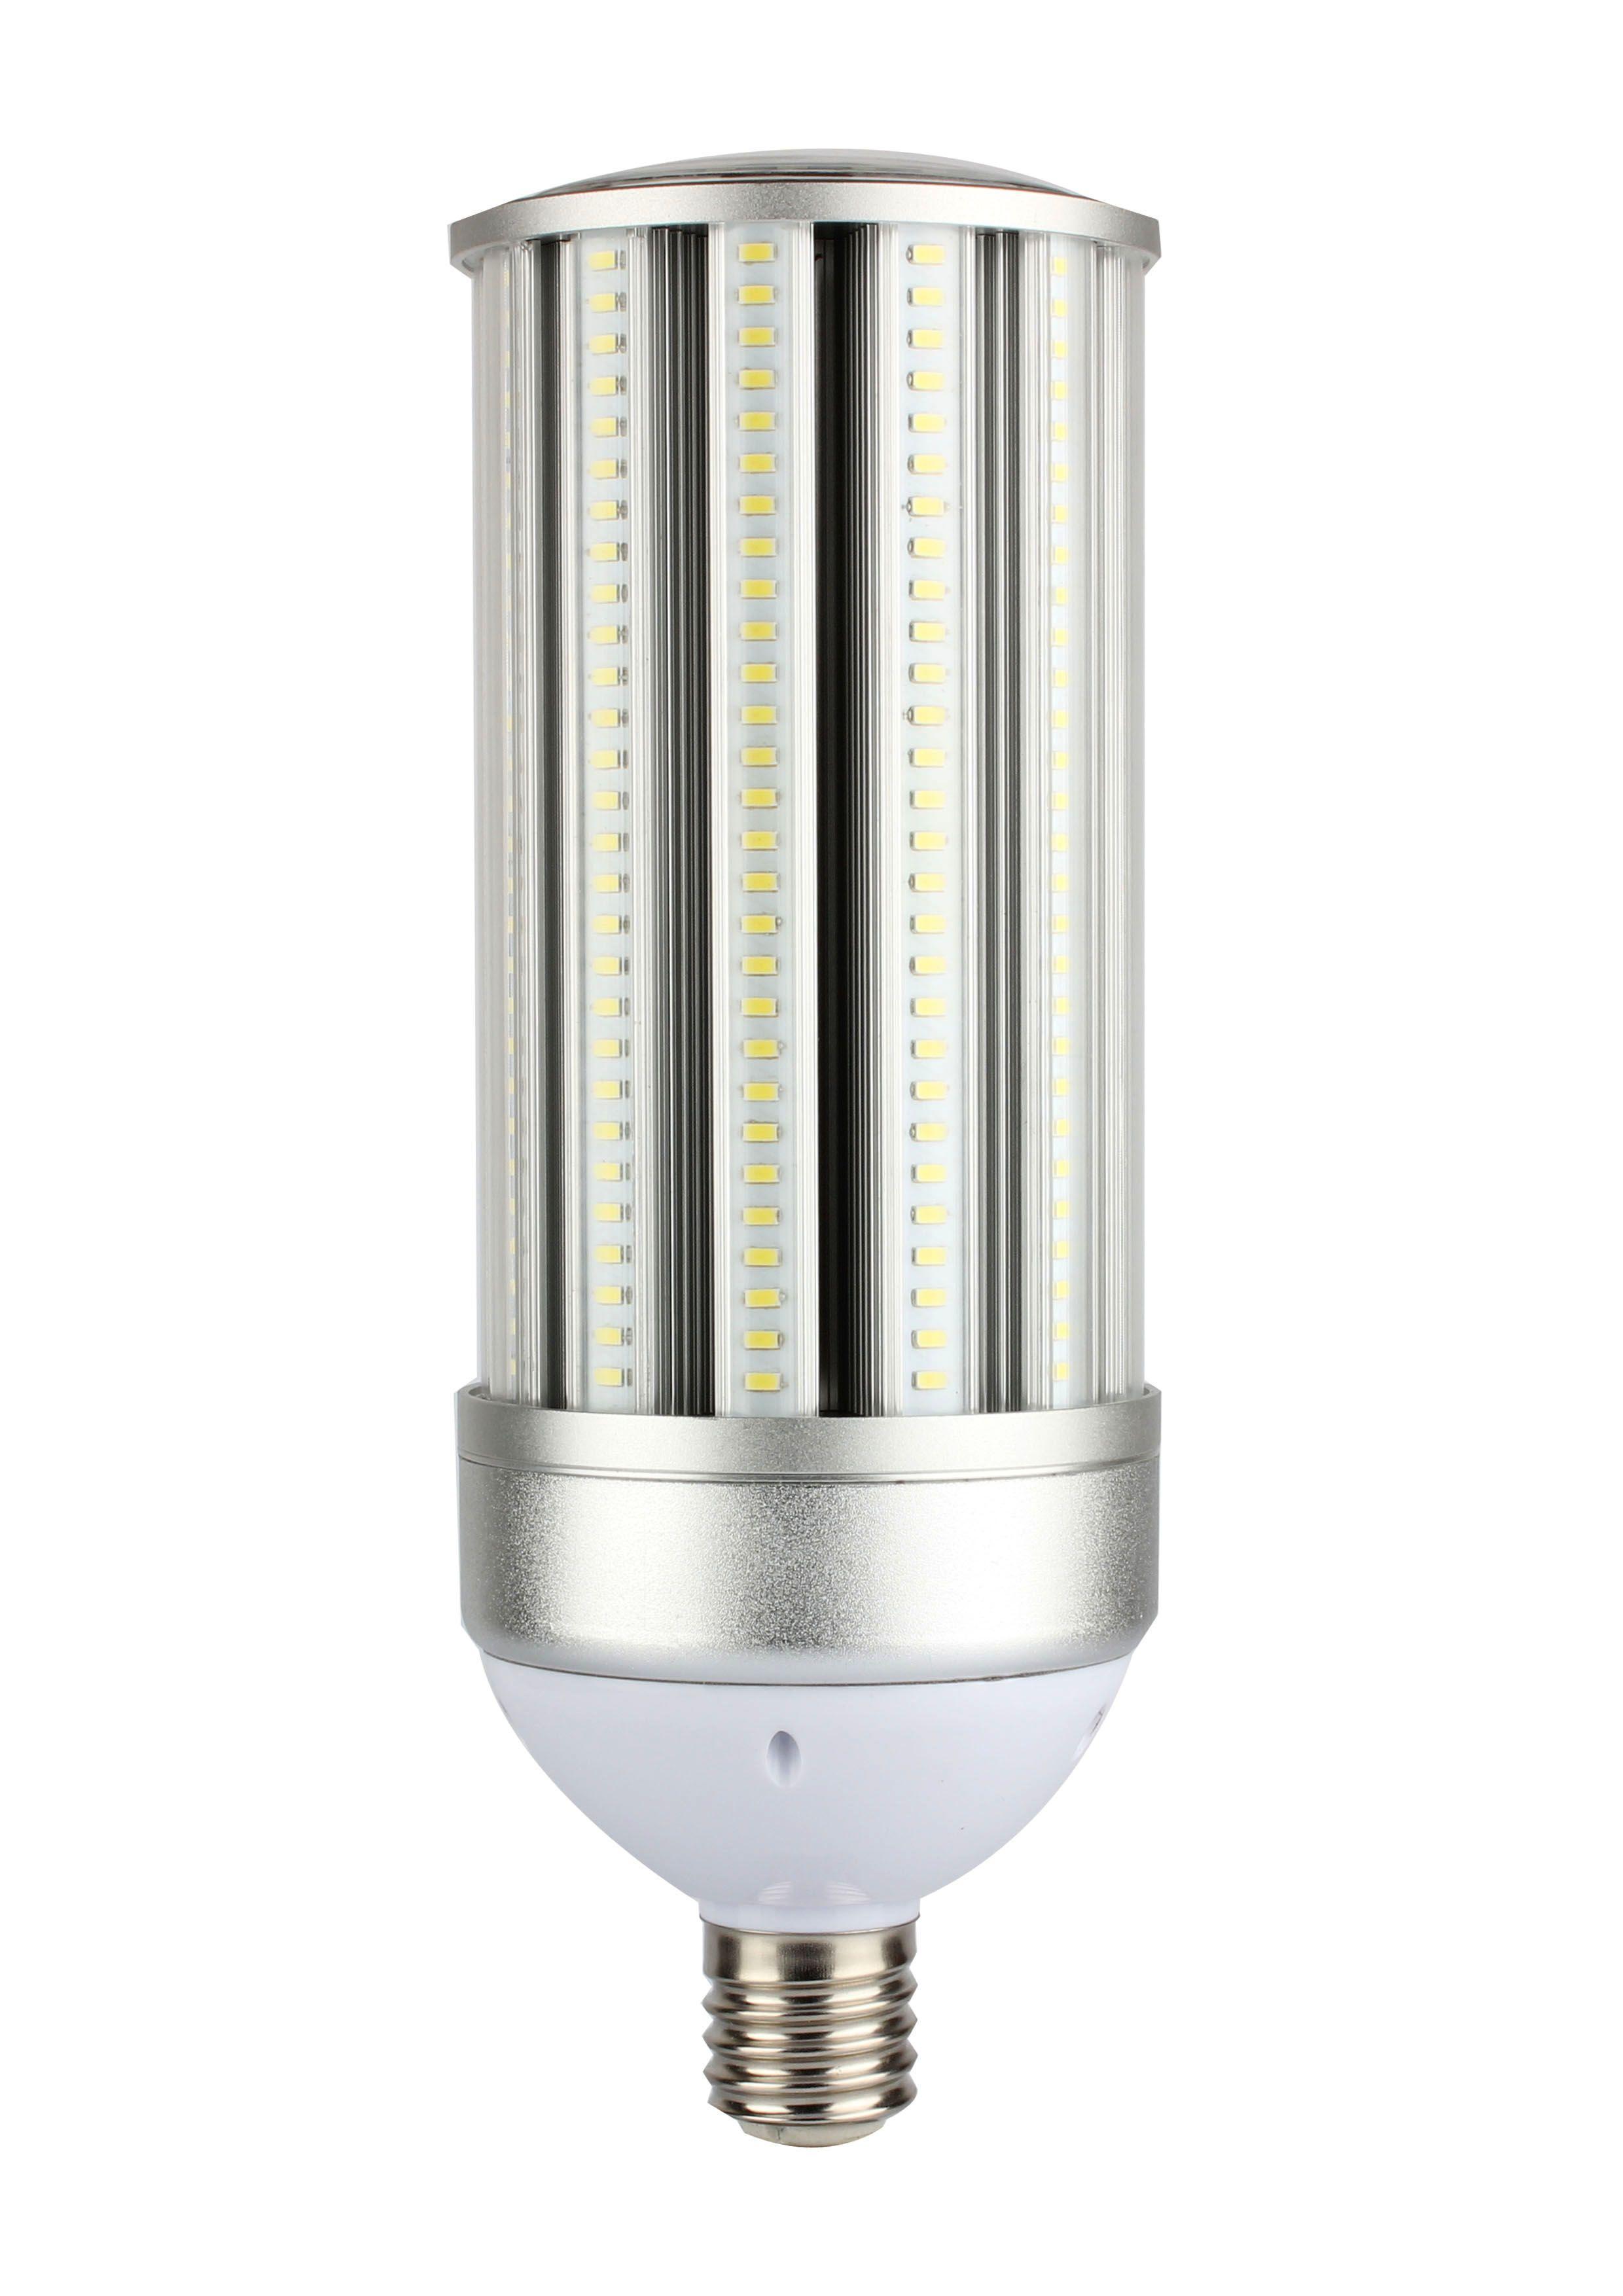 Led High Bay Lamp Low Light Corn Lam